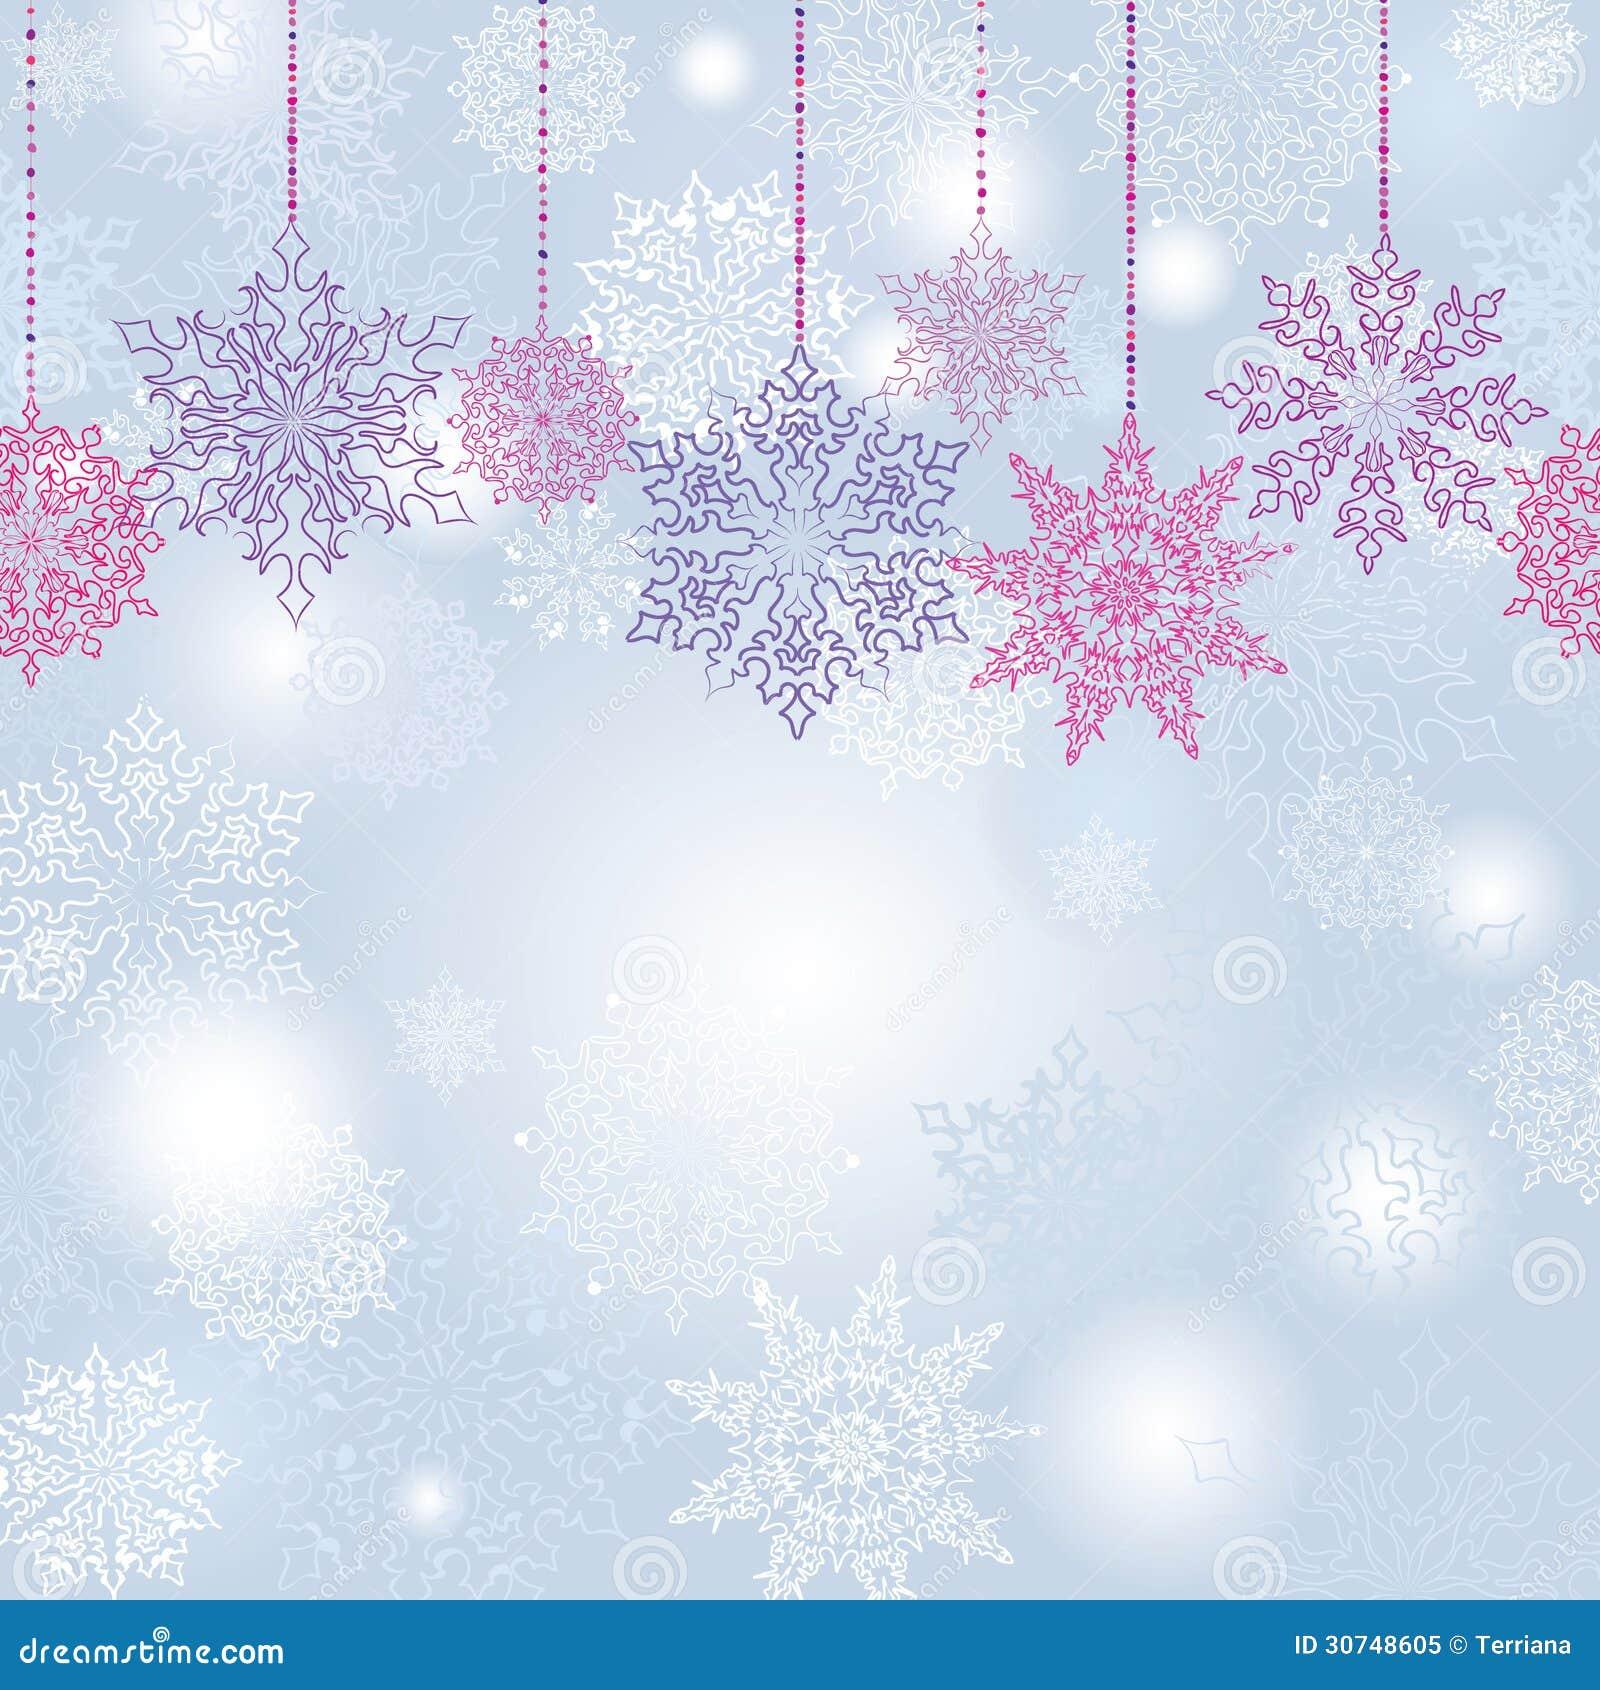 snowflakes seamless garland background royalty free stock photo